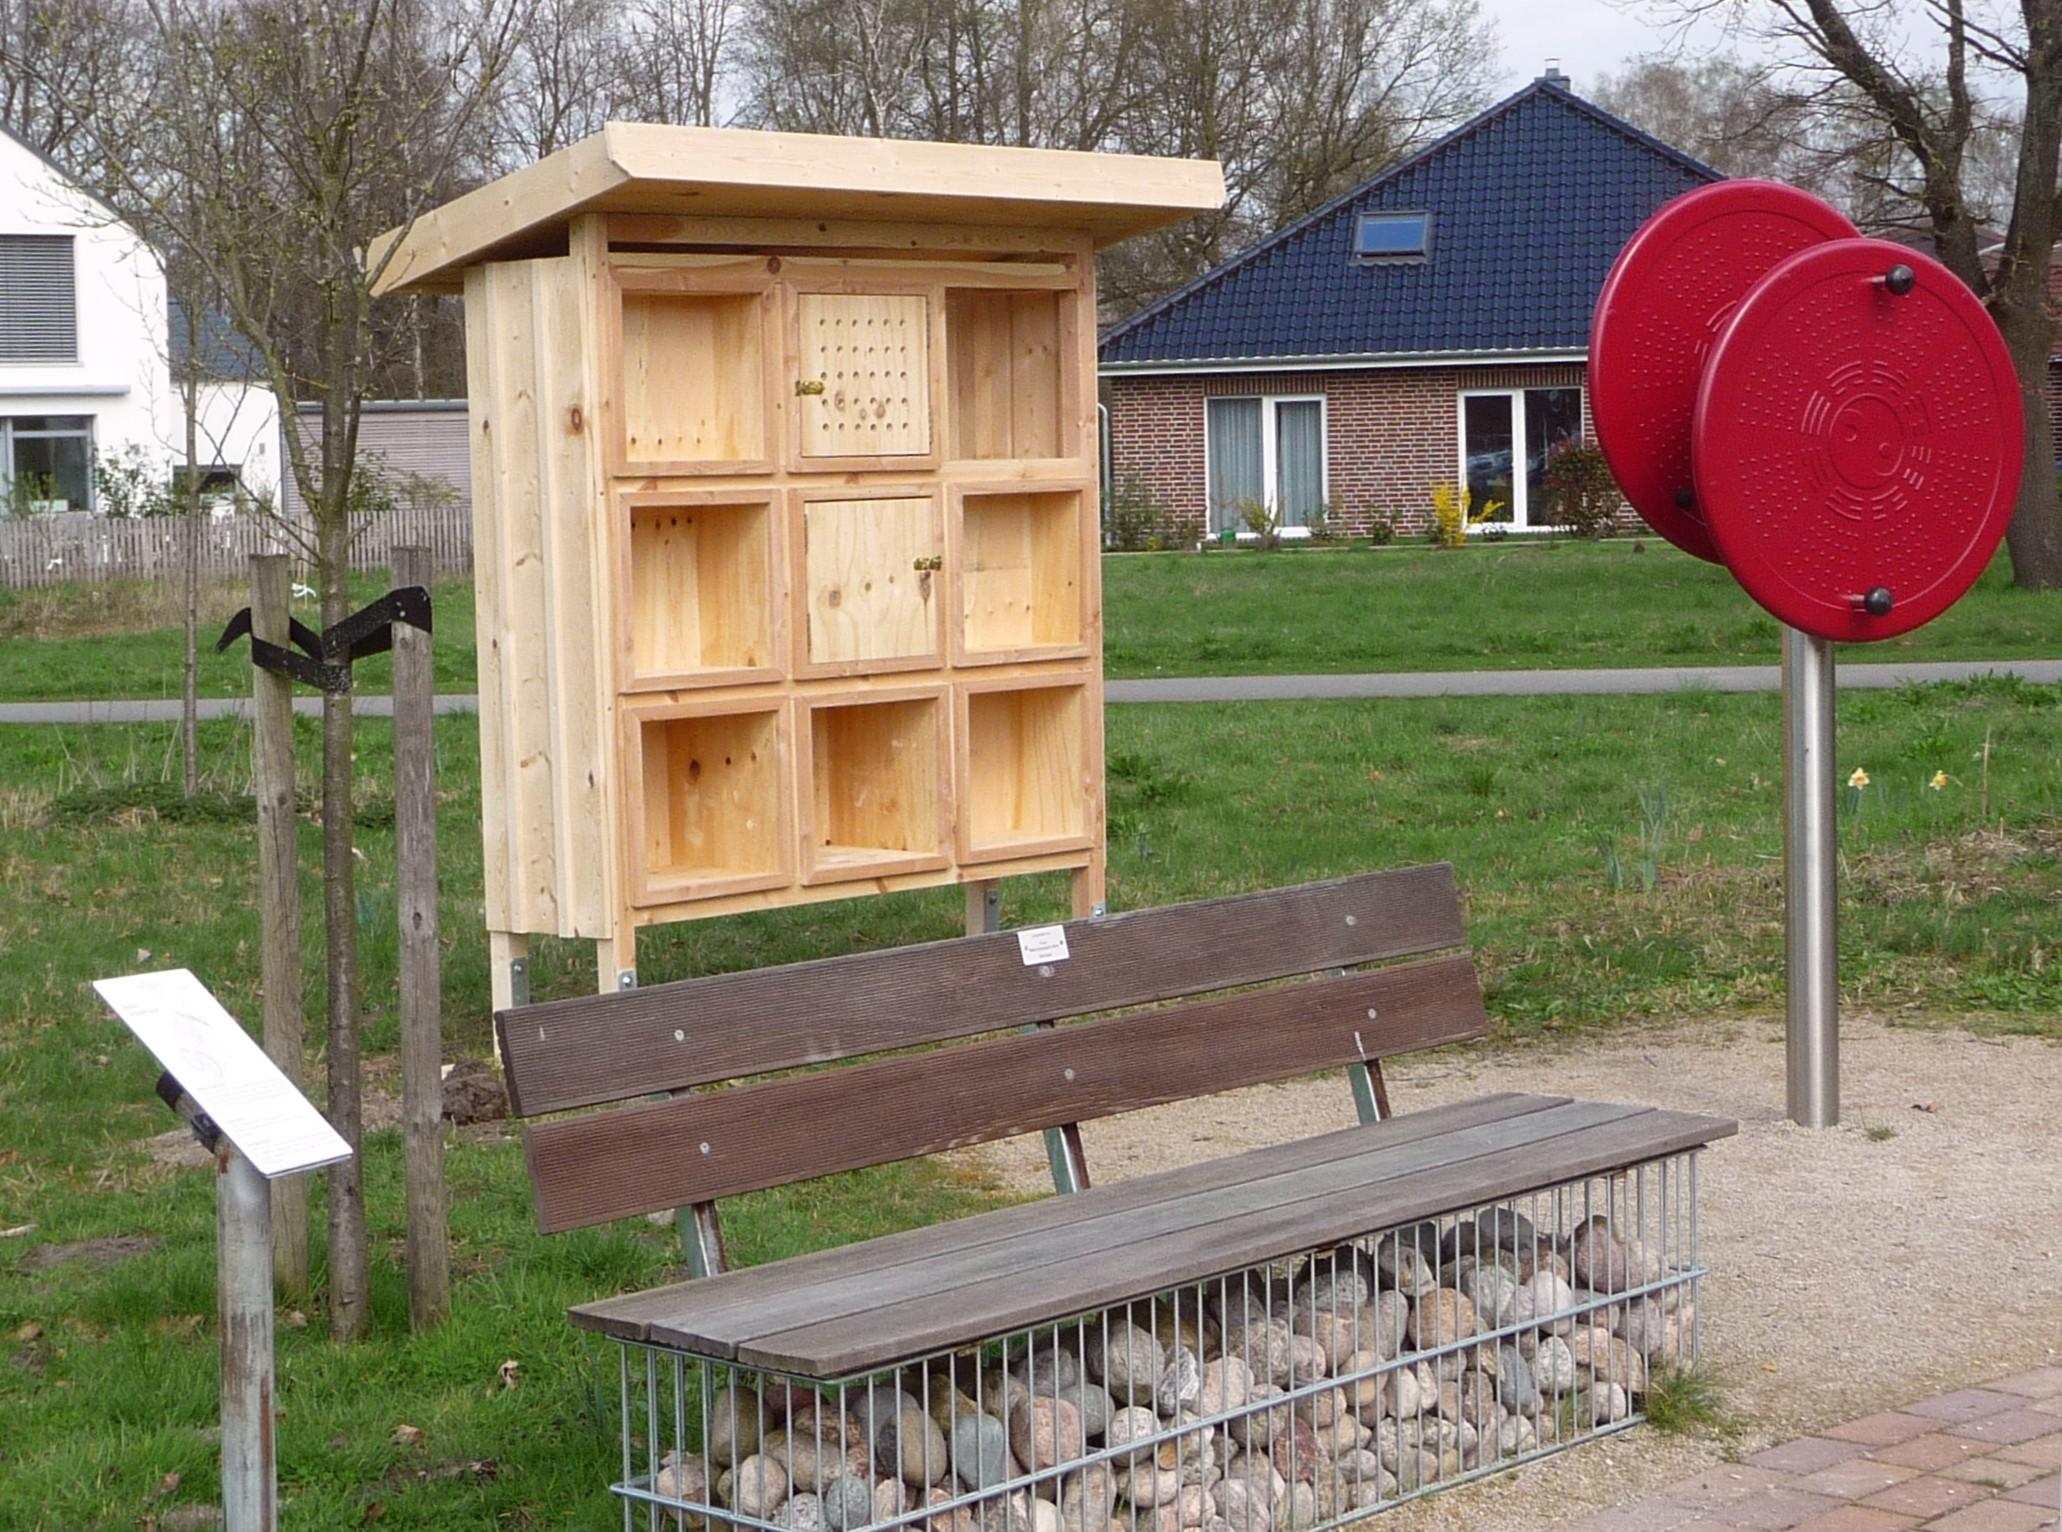 insektenhotel aufstellen insektenhotel hell gelb insekten. Black Bedroom Furniture Sets. Home Design Ideas